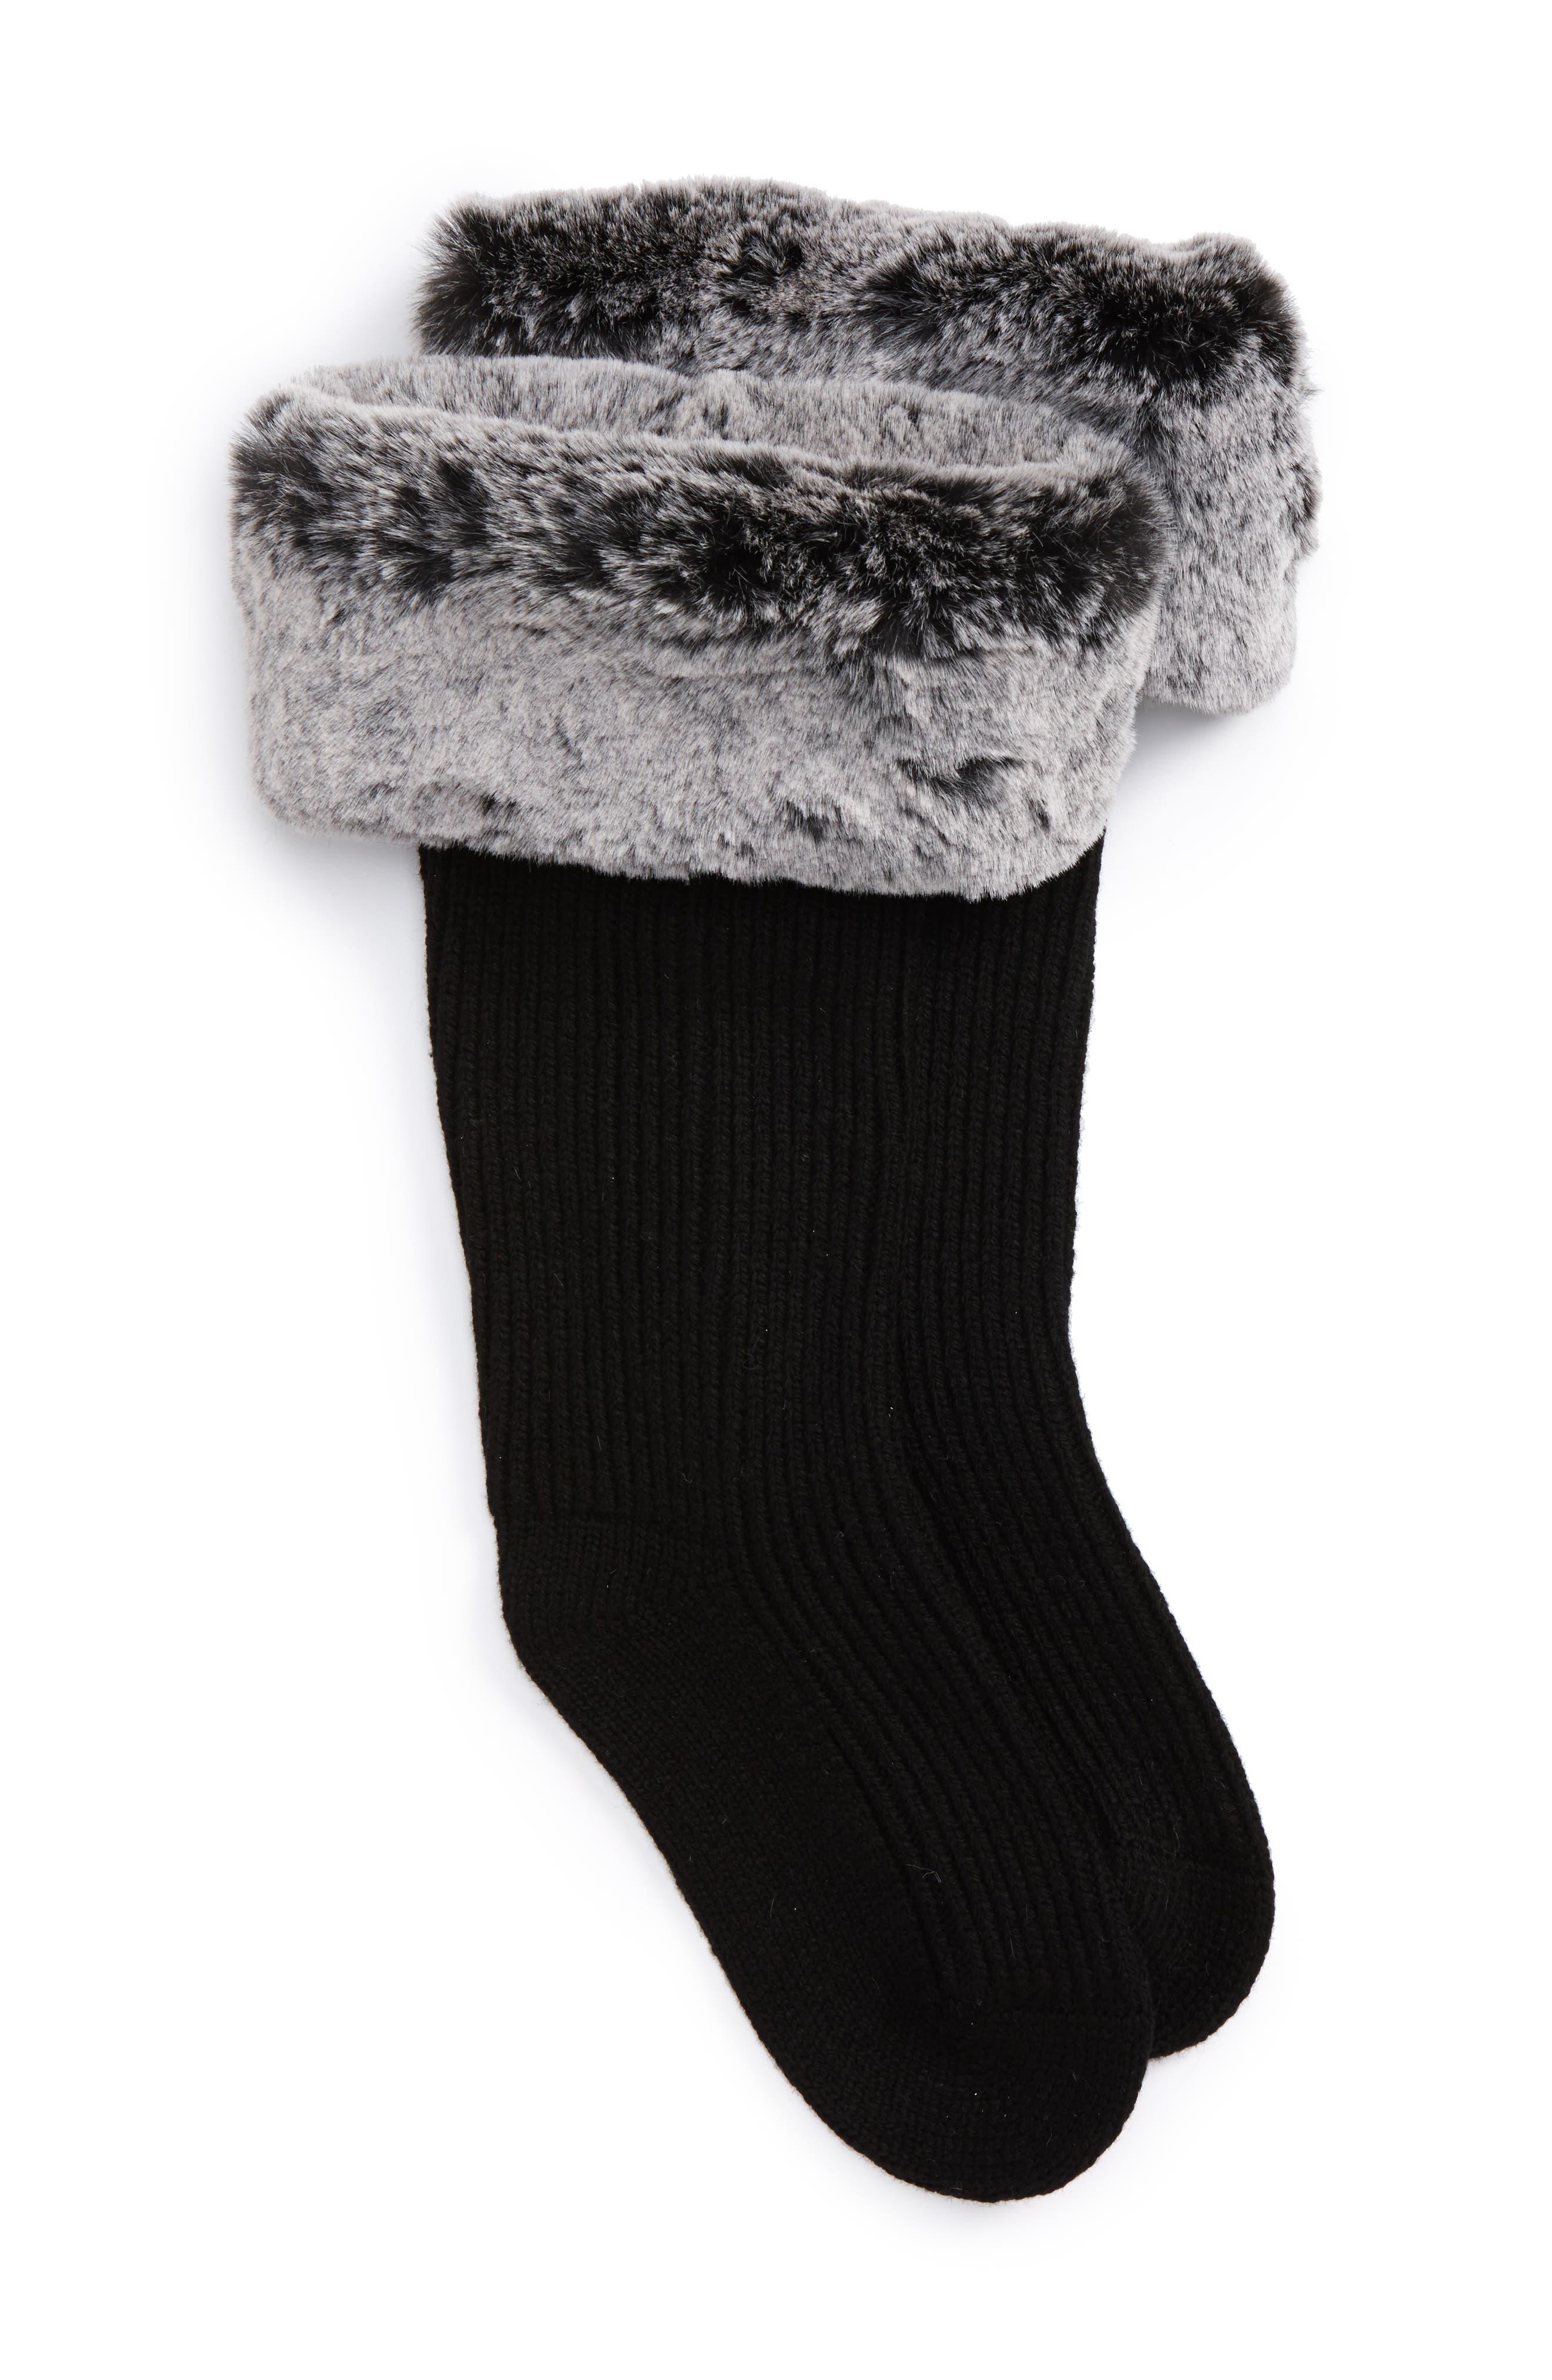 UGGpure<sup>™</sup> Tall Rain Boot Sock,                         Main,                         color, Charcoal Wool